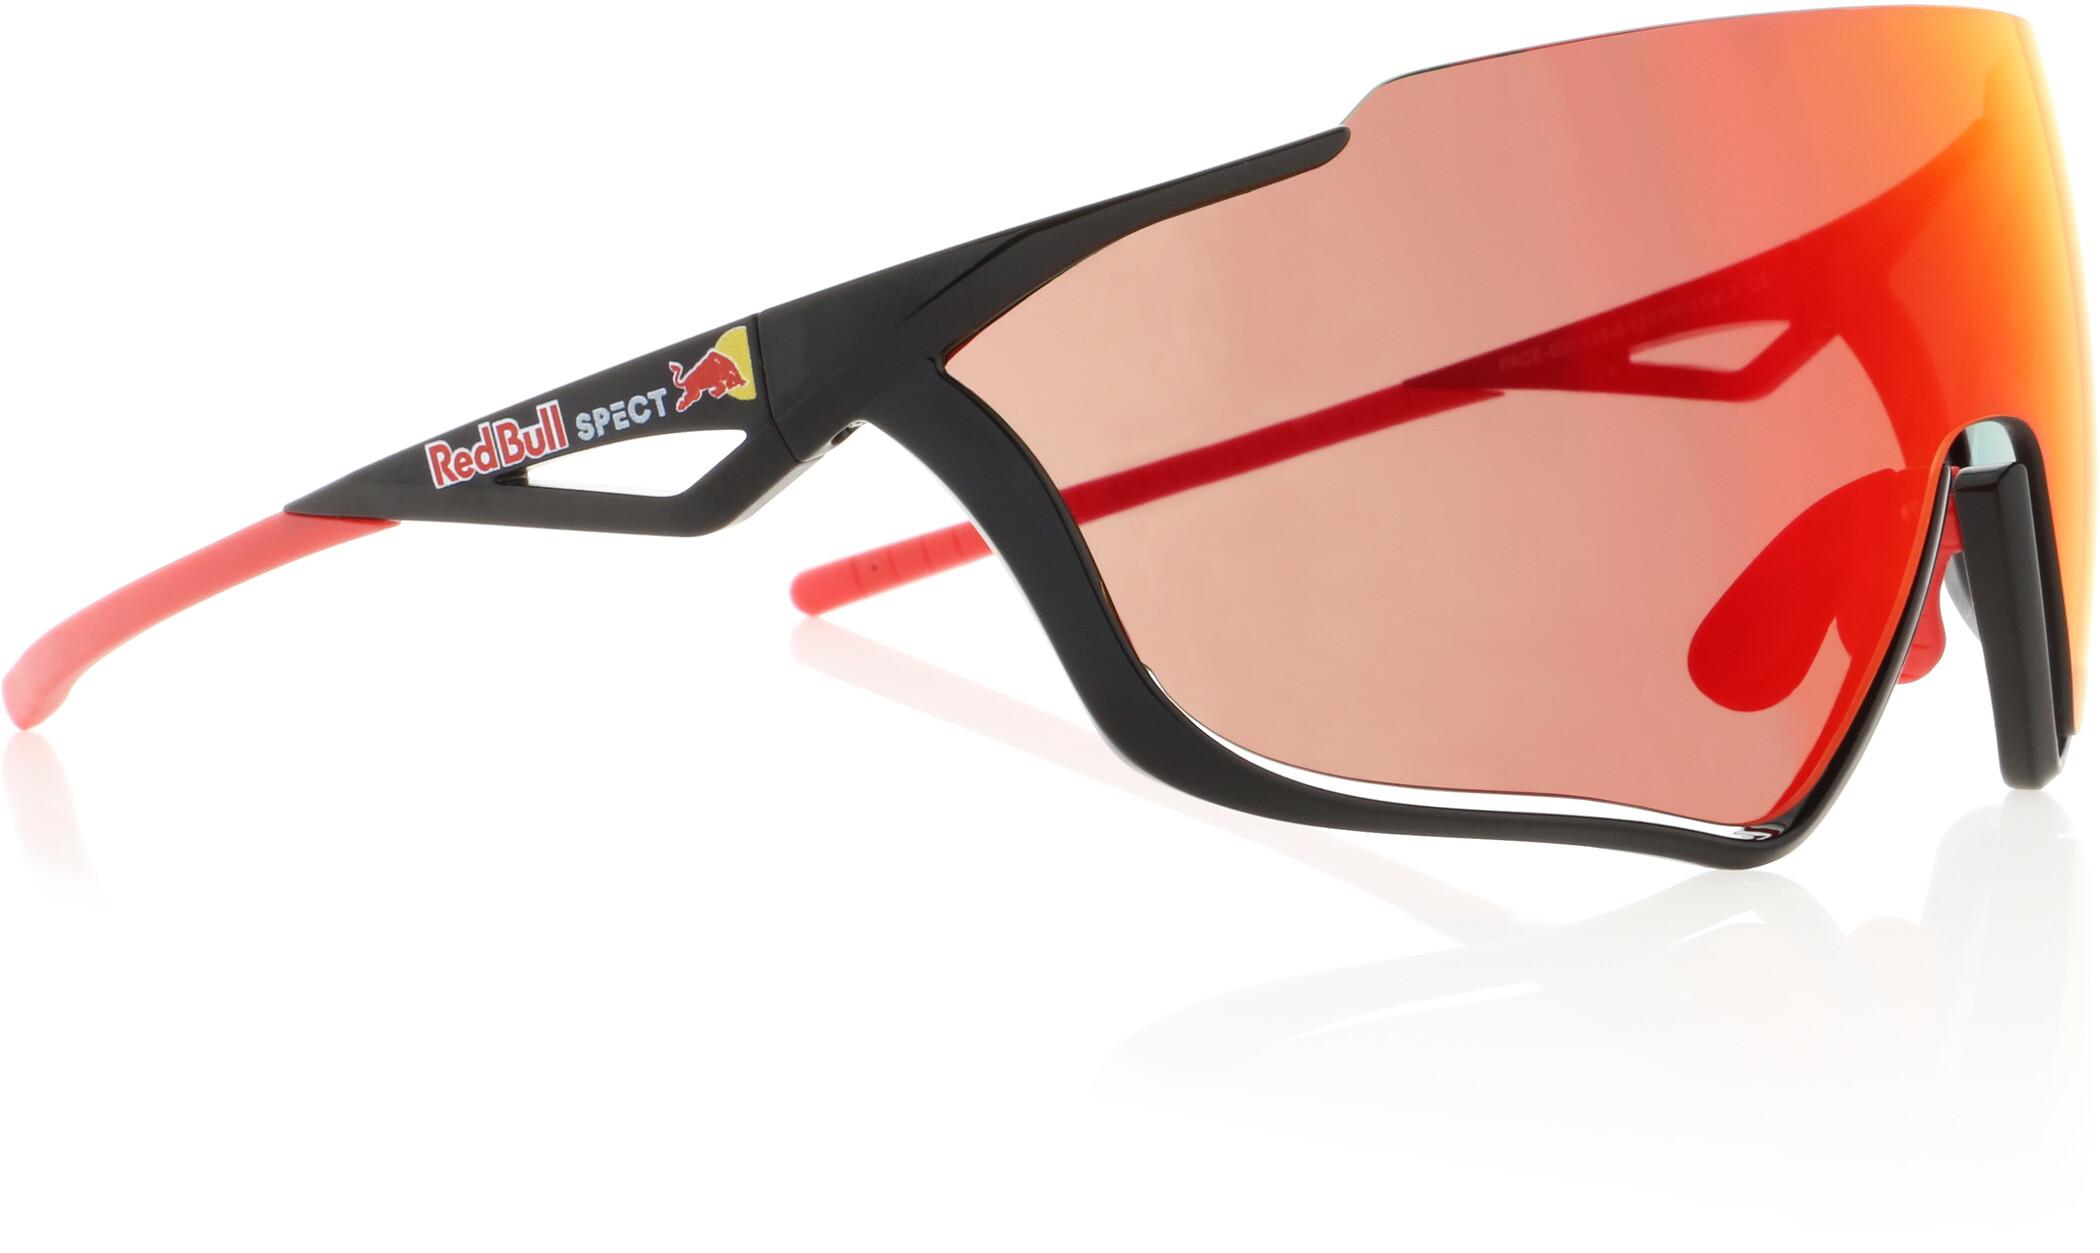 Red Bull SPECT Pace Sonnenbrille online kaufen |